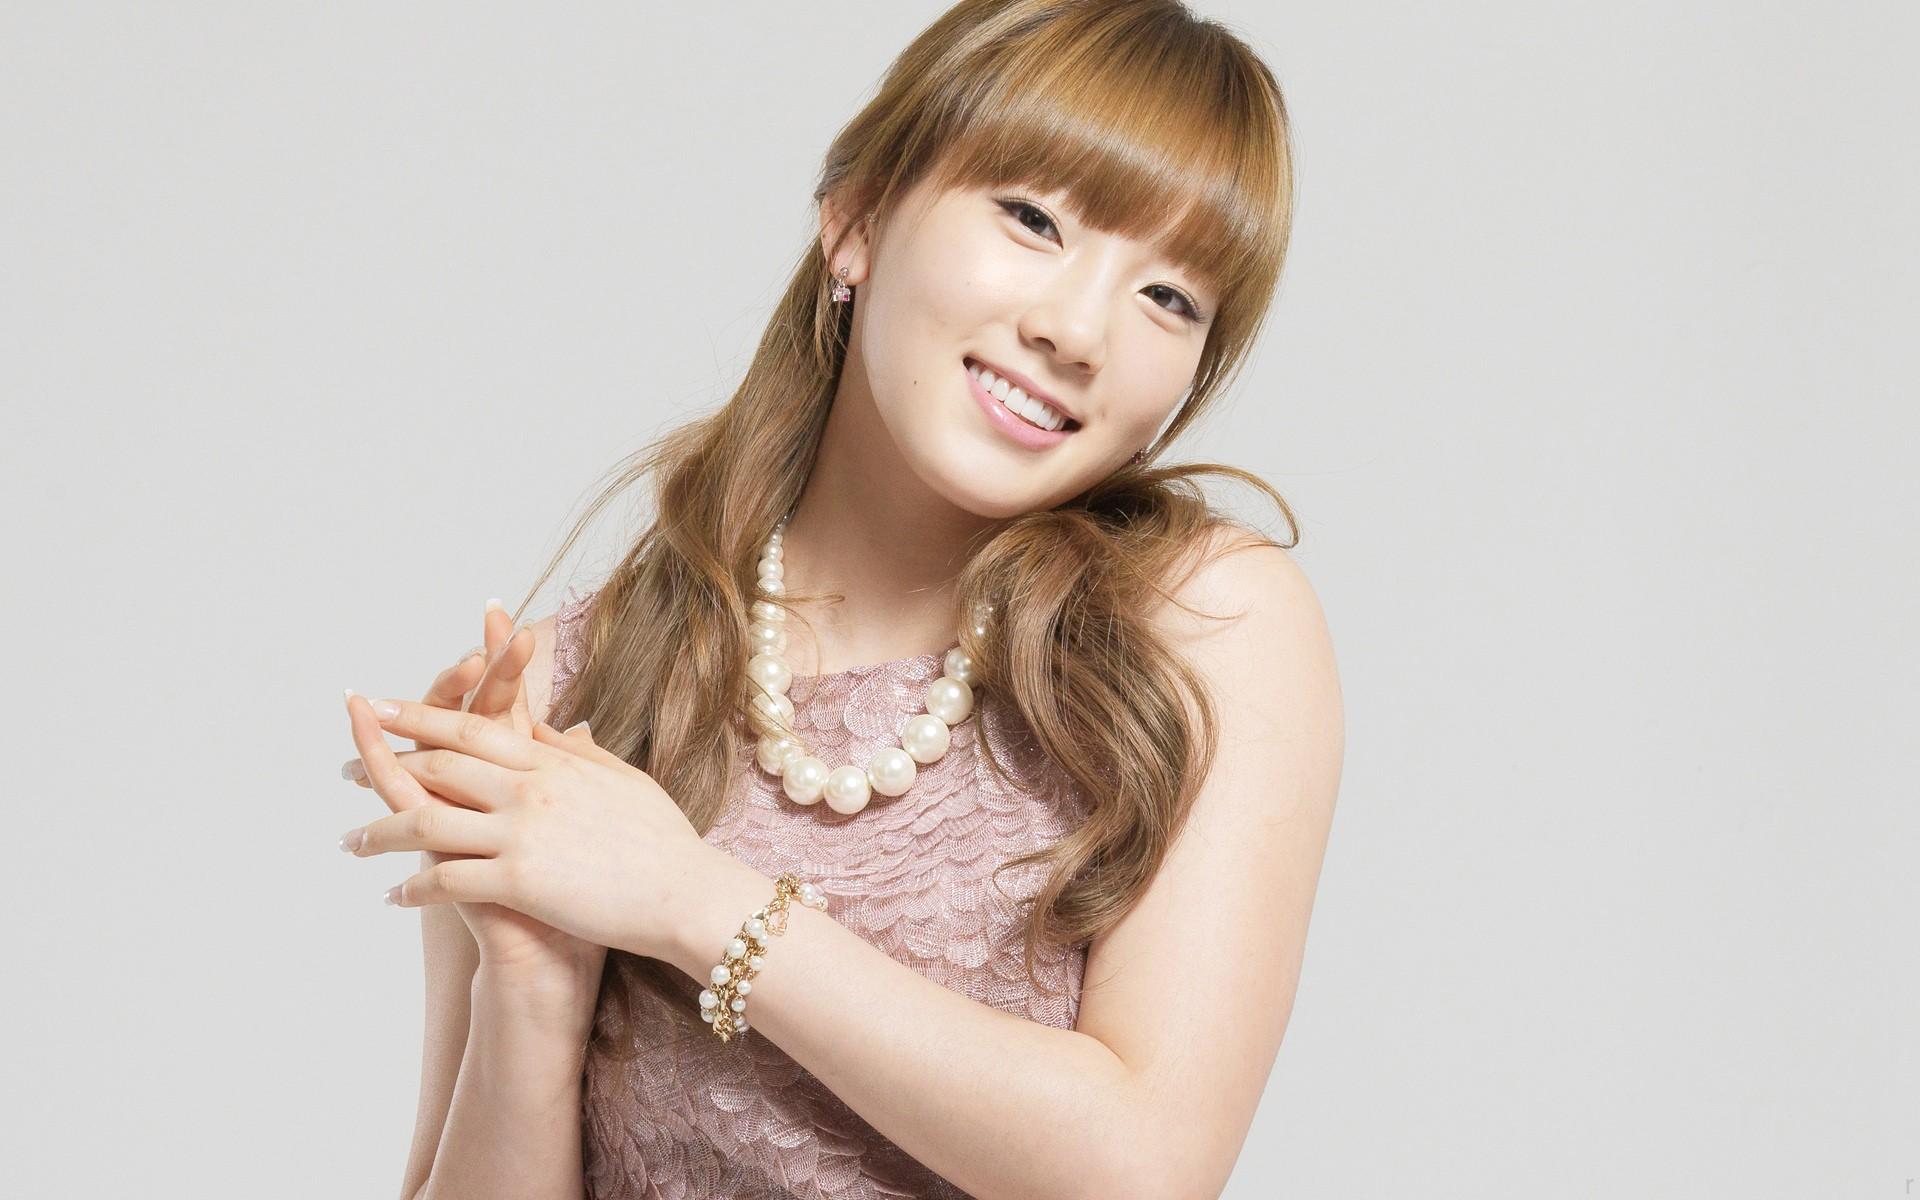 Kim Taeyeon hd 1920x1200   imagenes   wallpapers gratis   Modelos 1920x1200